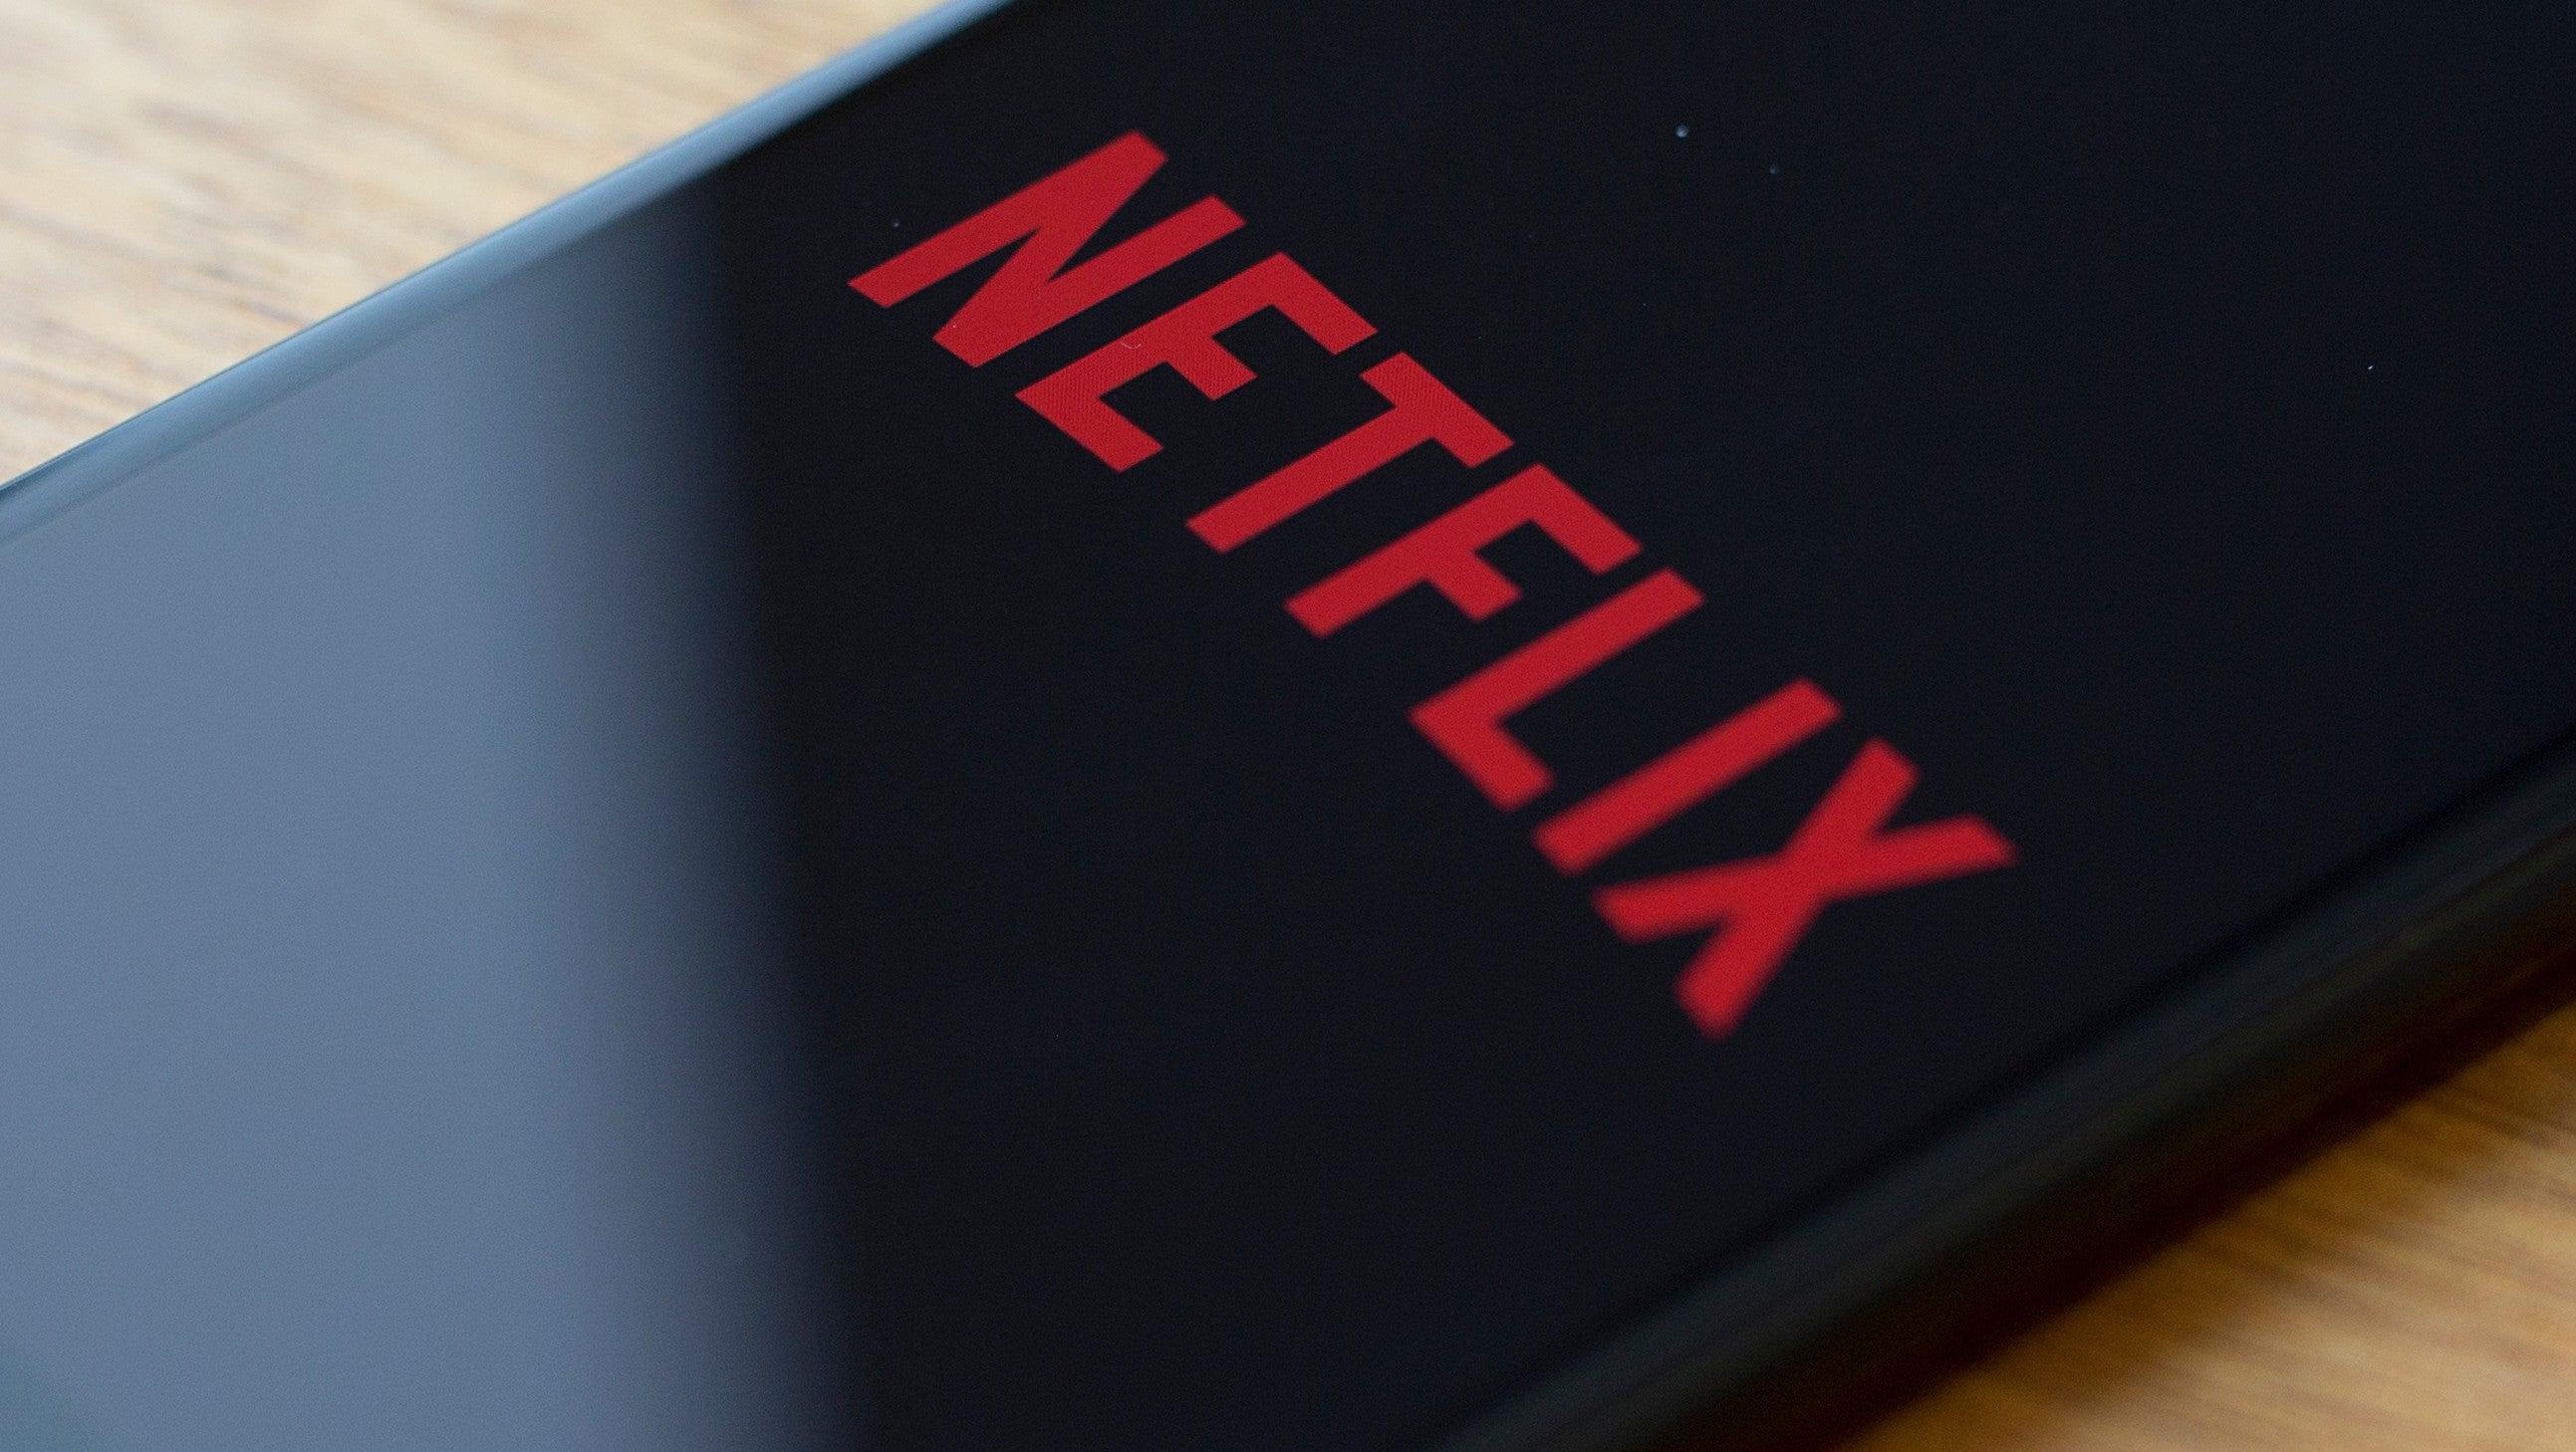 Netflix's Chosen Fighter To Take On Disney+ Is, Uh, Nickelodeon